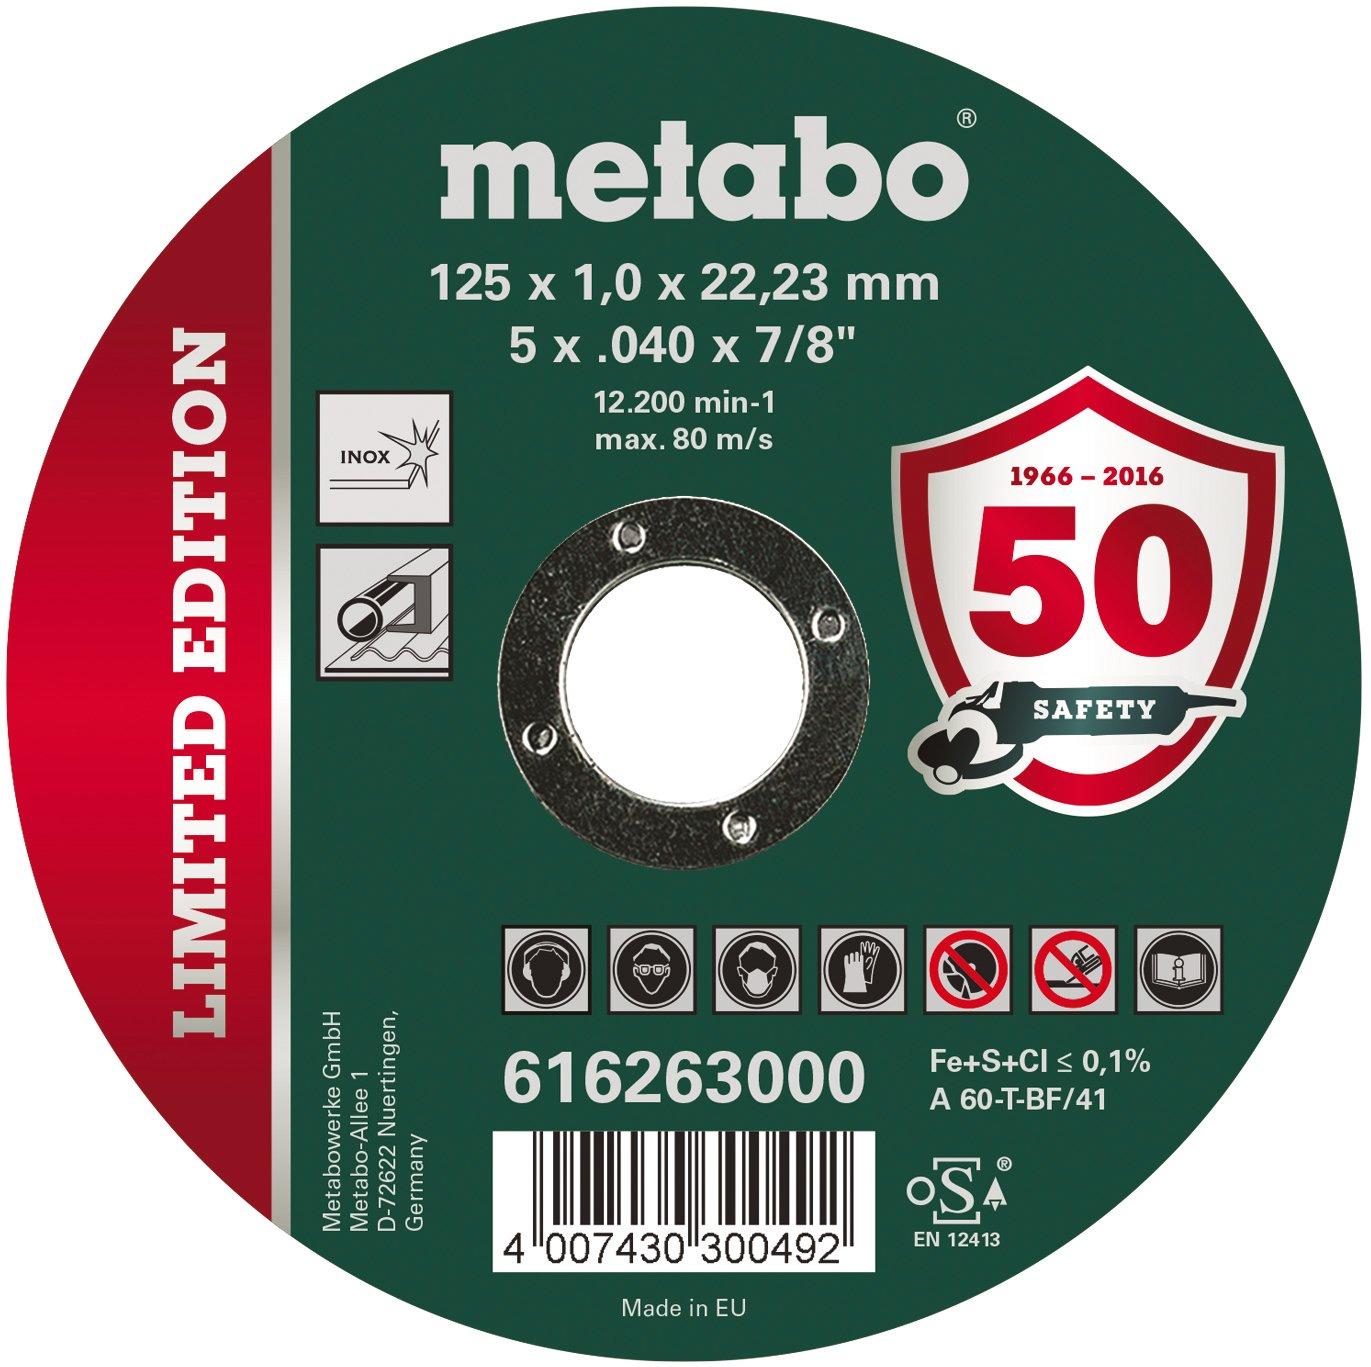 METABO - Limited Edition 125 x 1,0 x 22,23 Inox, TF 41